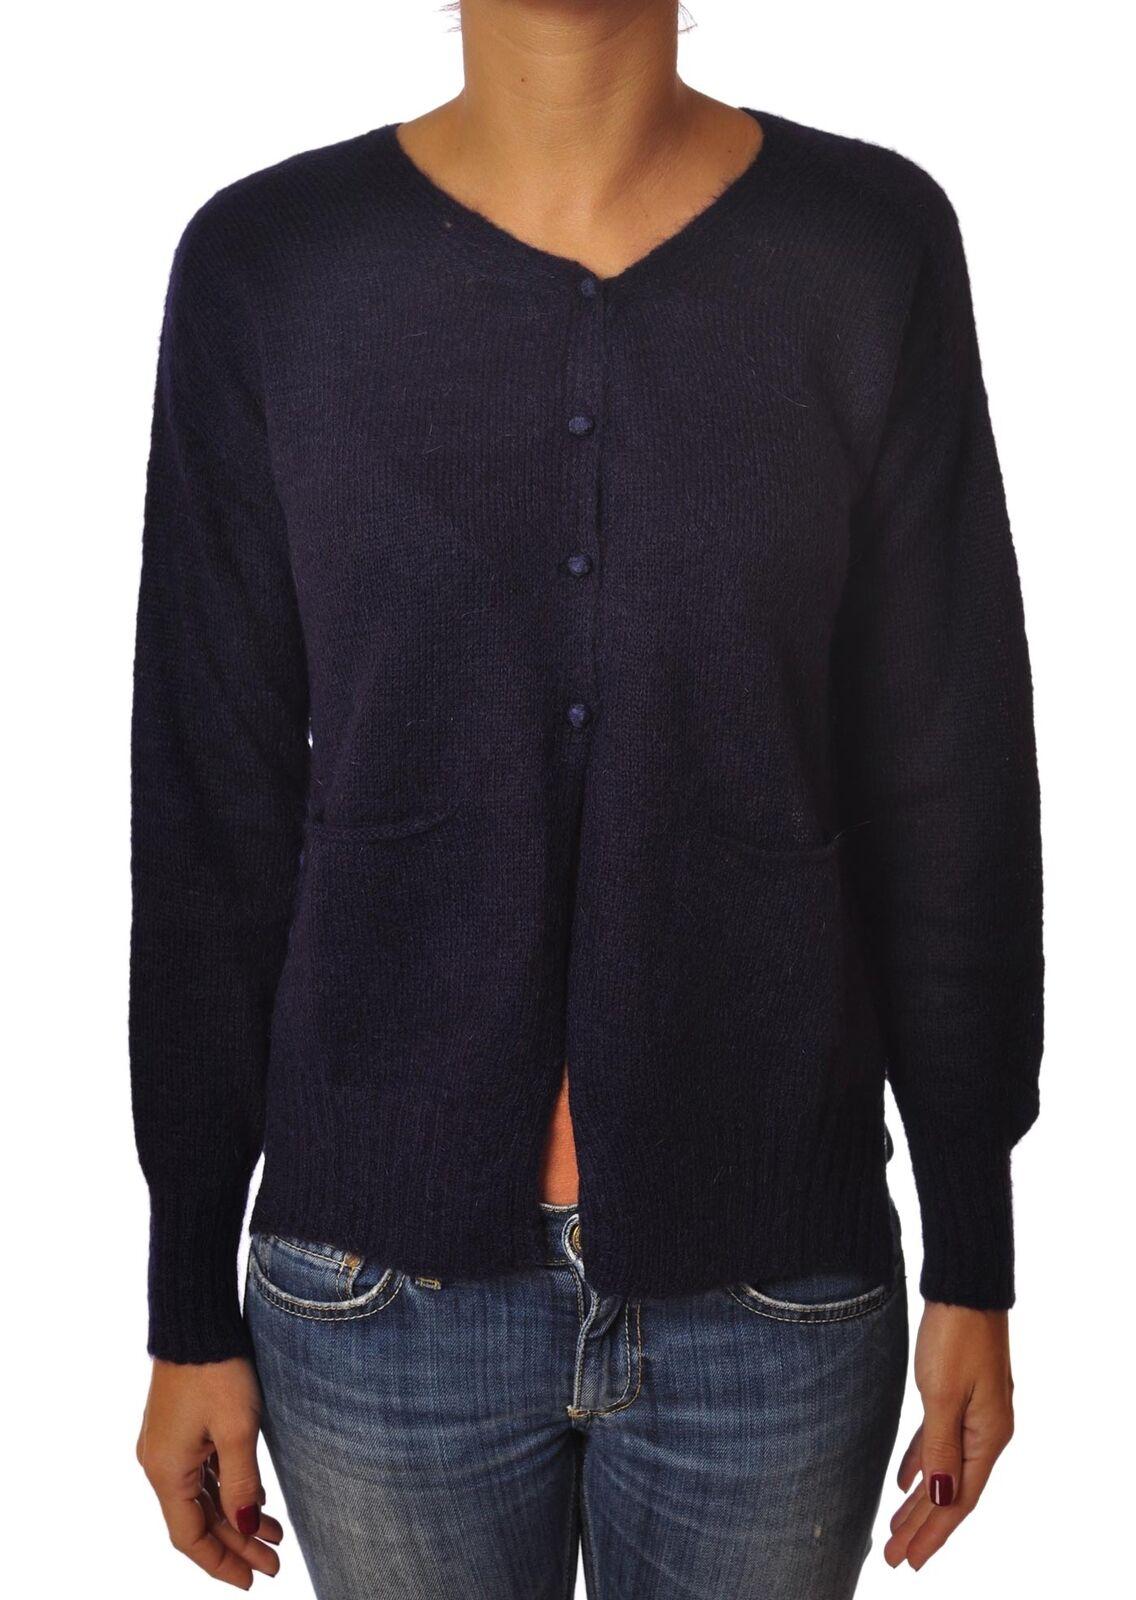 O.D.D. - Knitwear-Cardigan - Woman - Blau - 4273024B184212